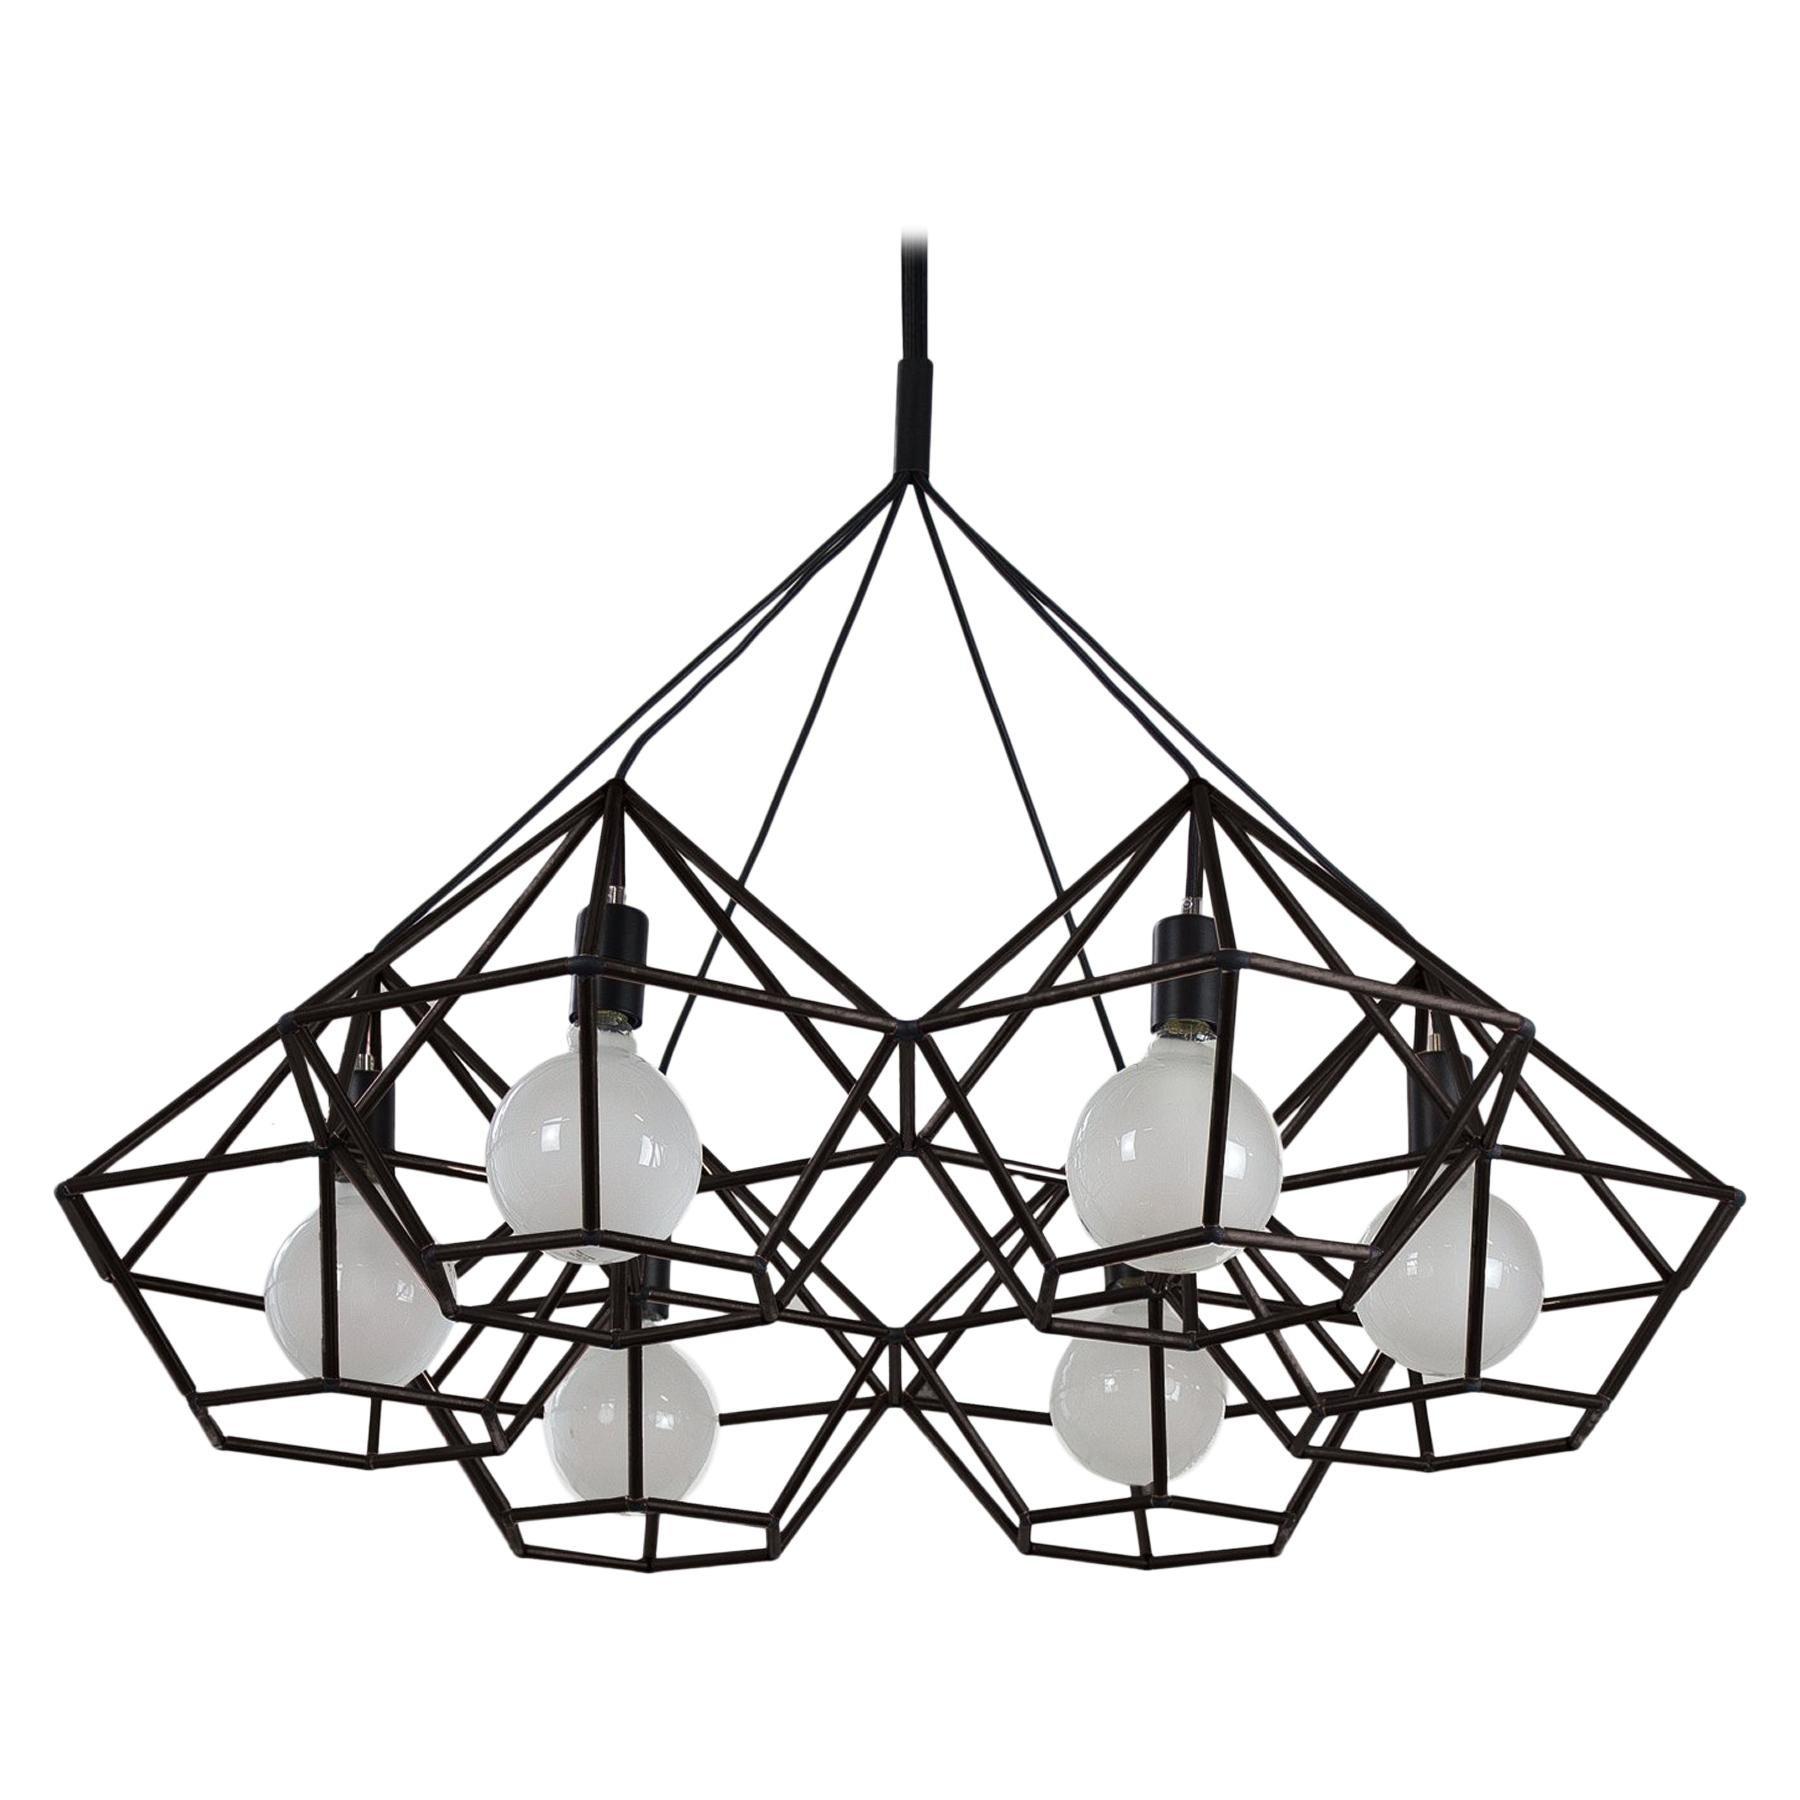 Rough Diamond Chandelier Modern Black Tube Geometric Pendant